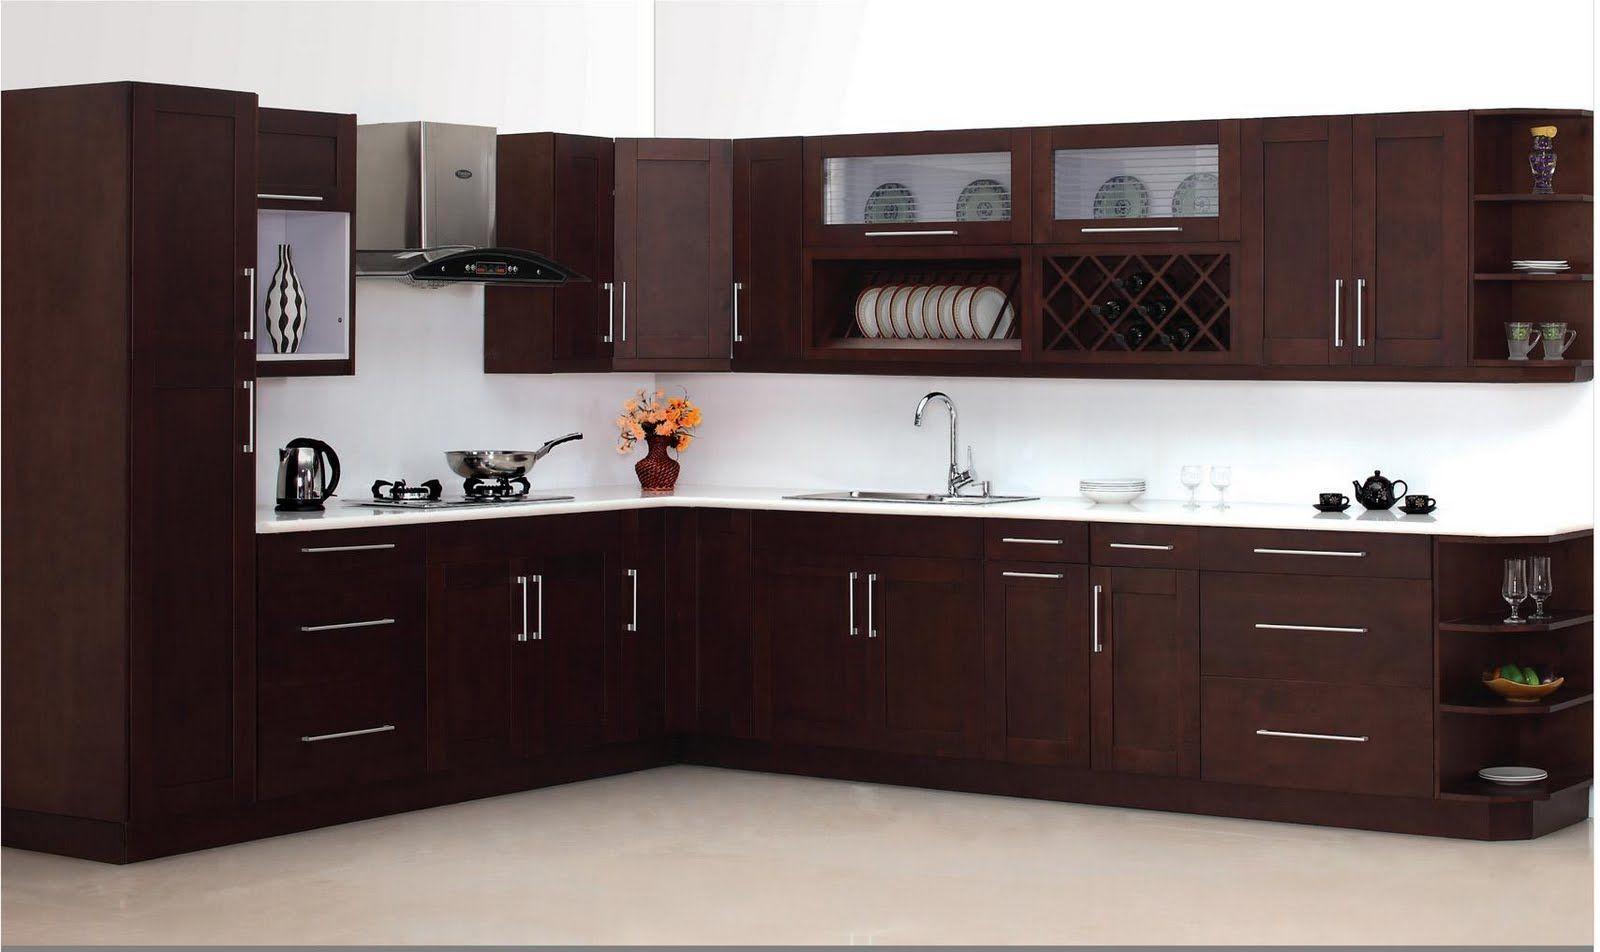 cocina grande en forma L marron oscuro | Cocinas | Pinterest ...